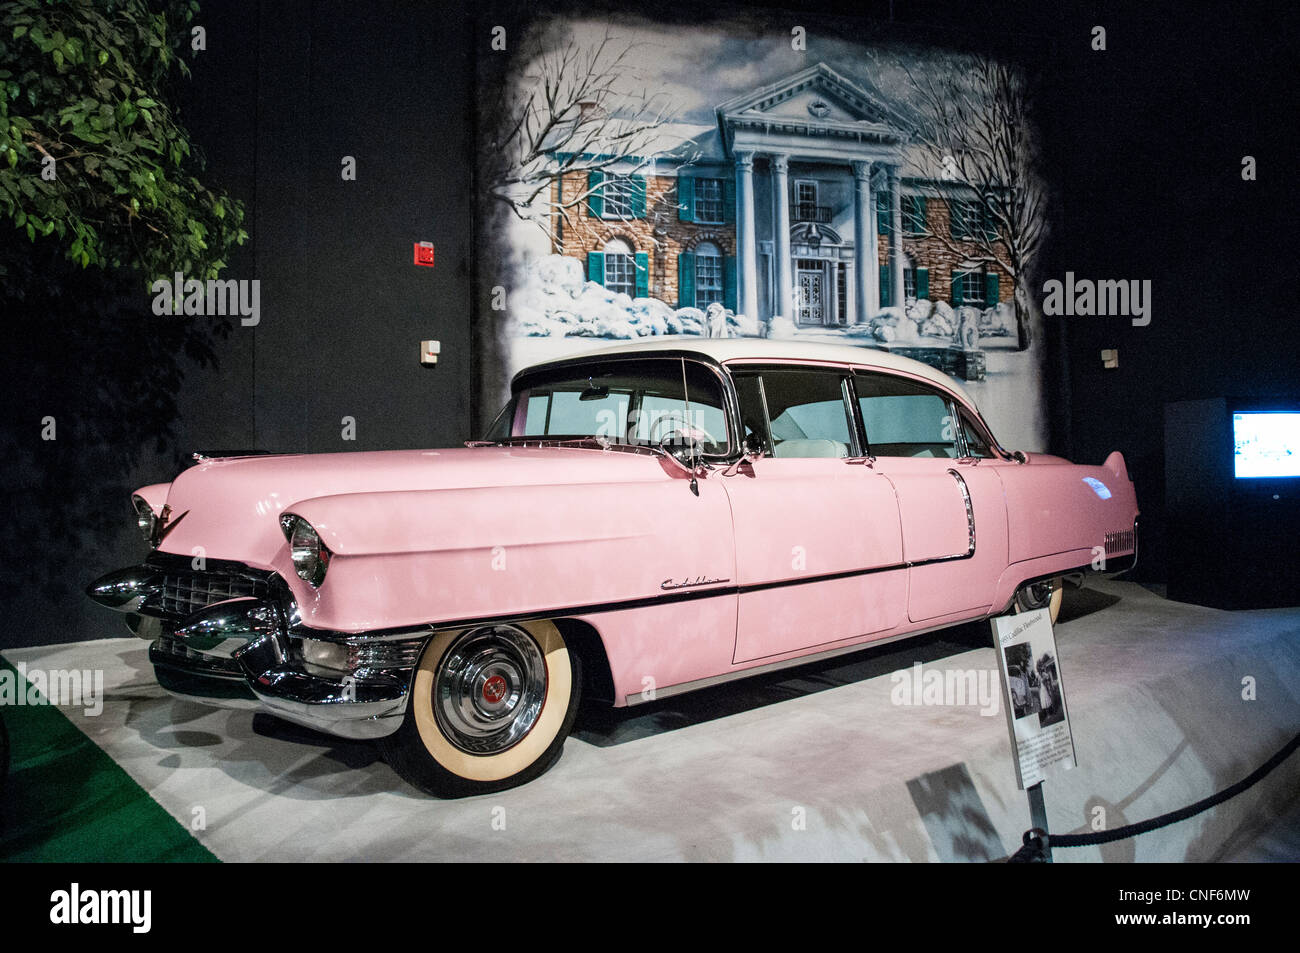 Elvis Presley's home and museum Graceland, car museum with Elvis 1956 Cadillac Eldorado Stock Photo